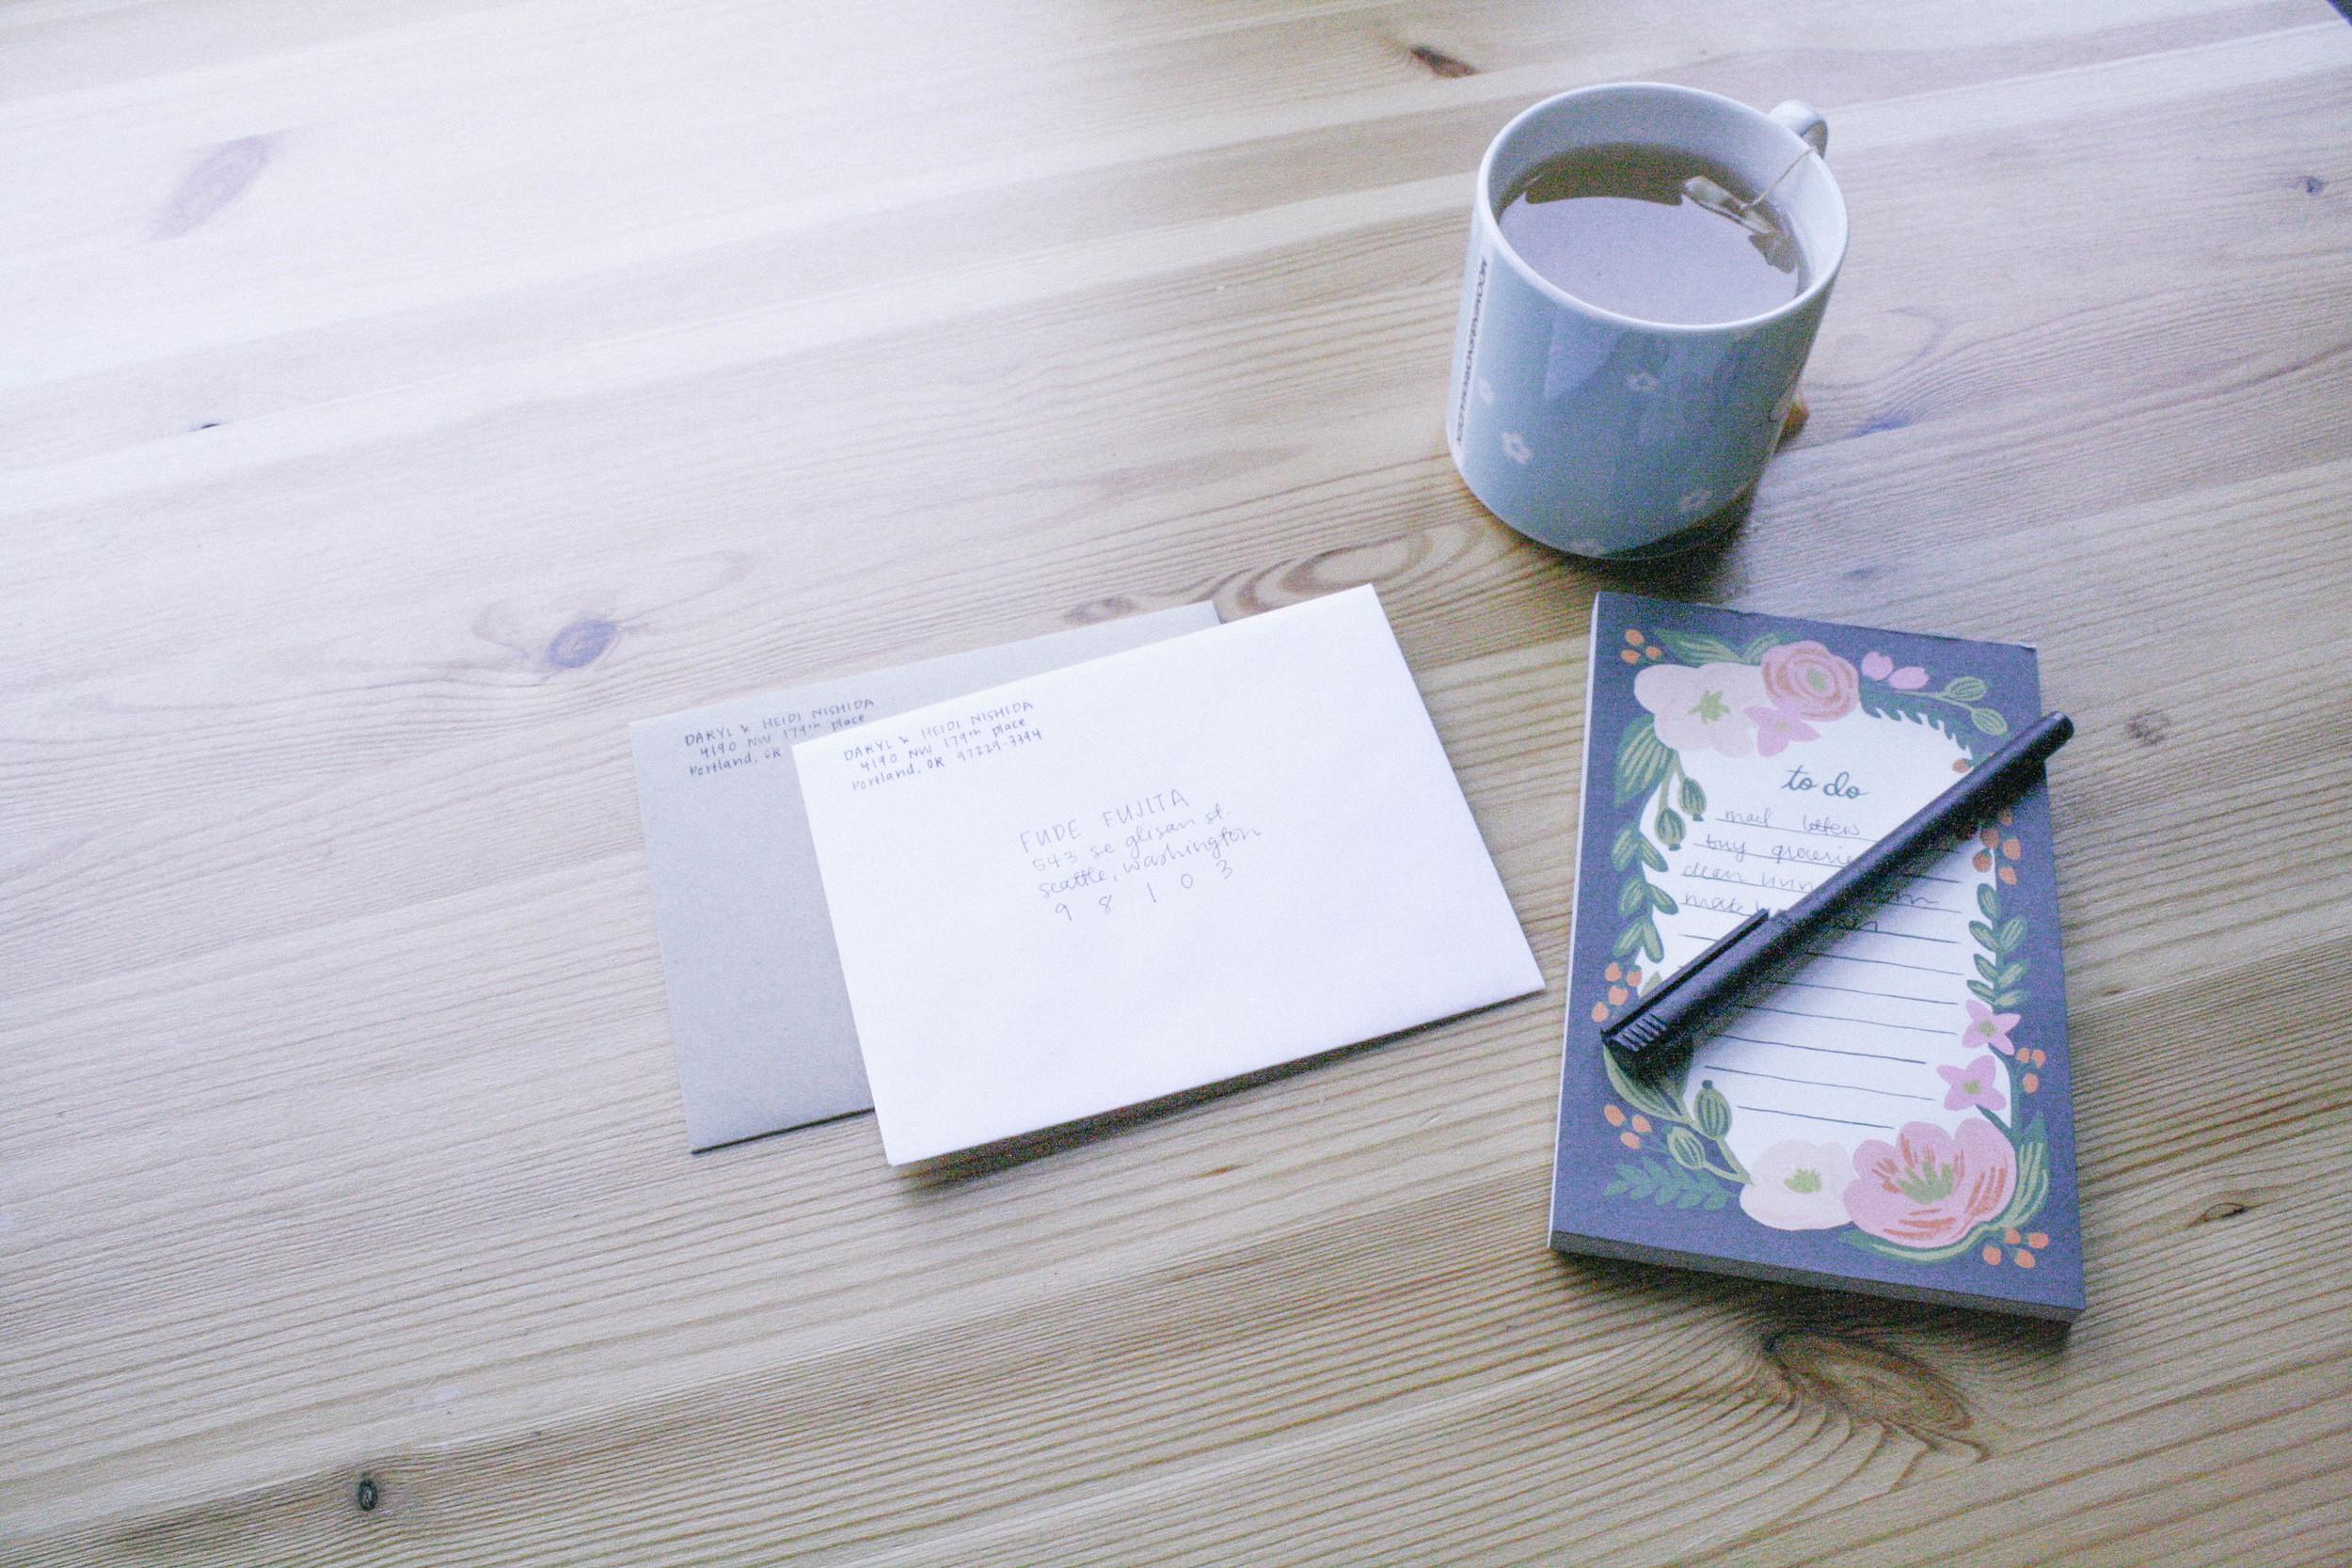 custom-address-stamp-by-everglow-handmade-11